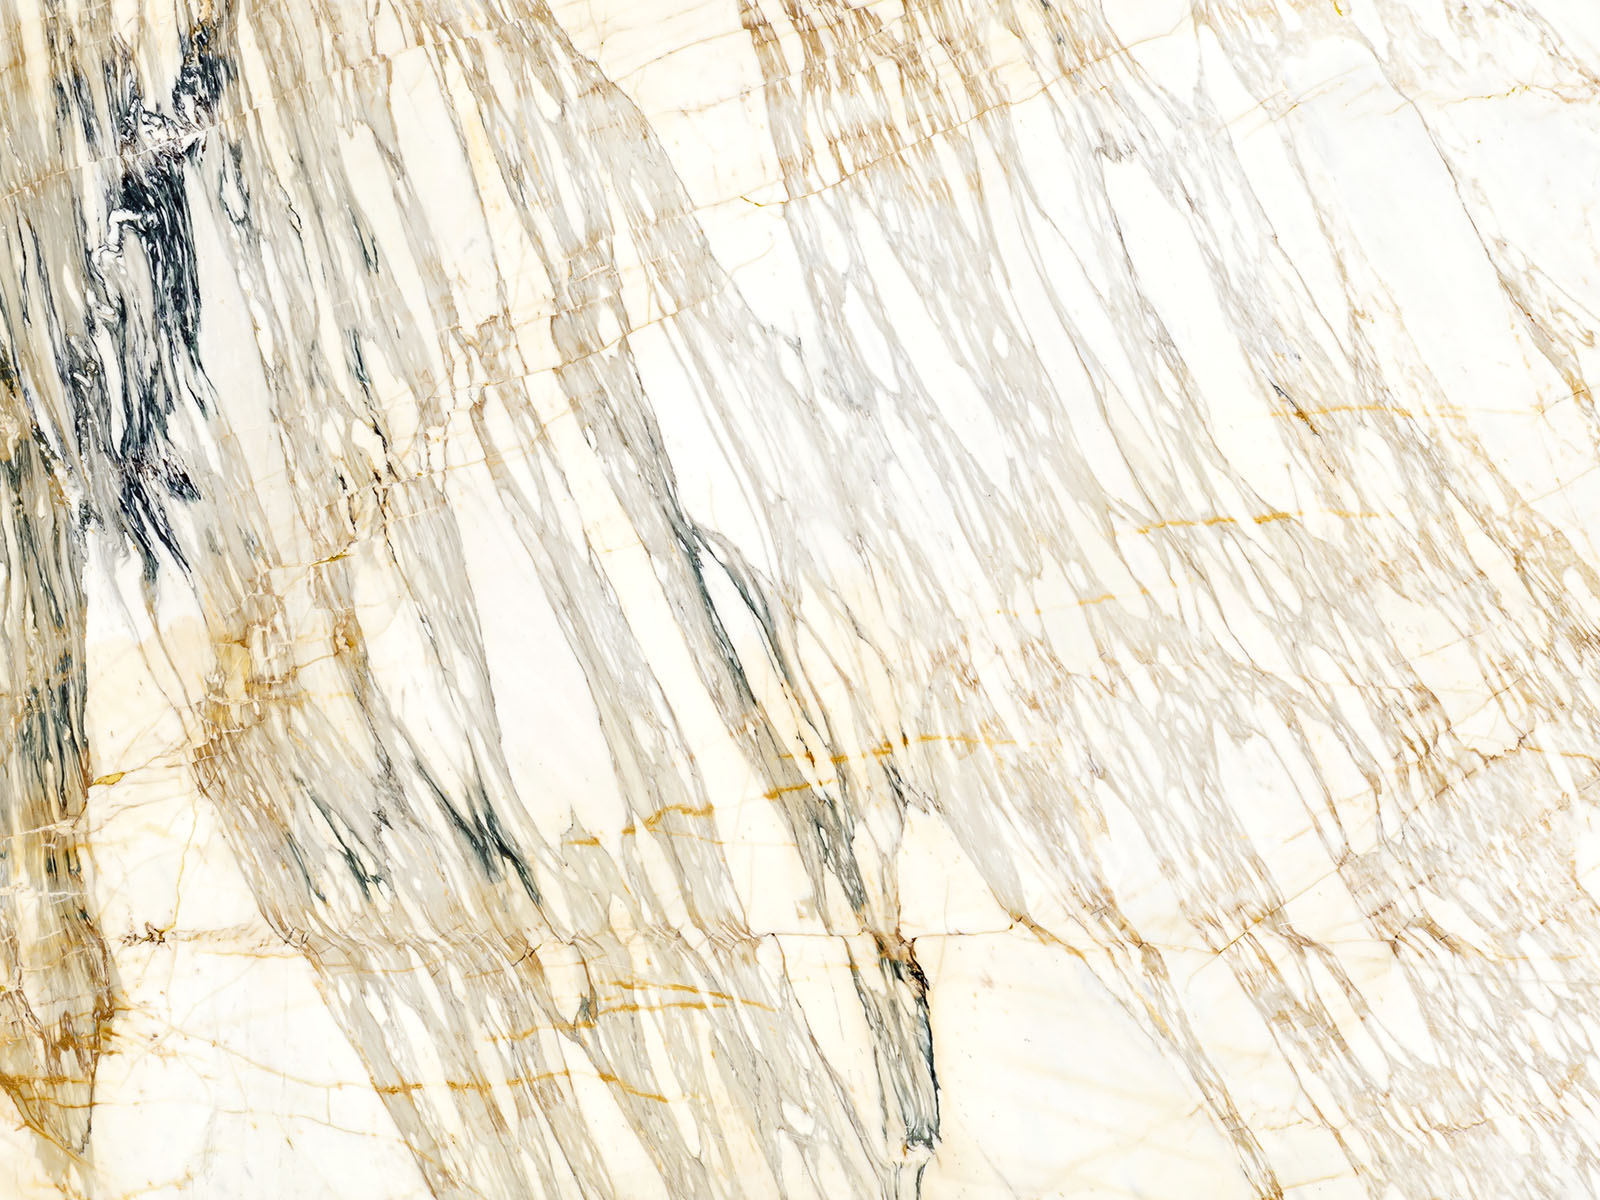 View of Marble - Calacatta Avant Garde 2cm